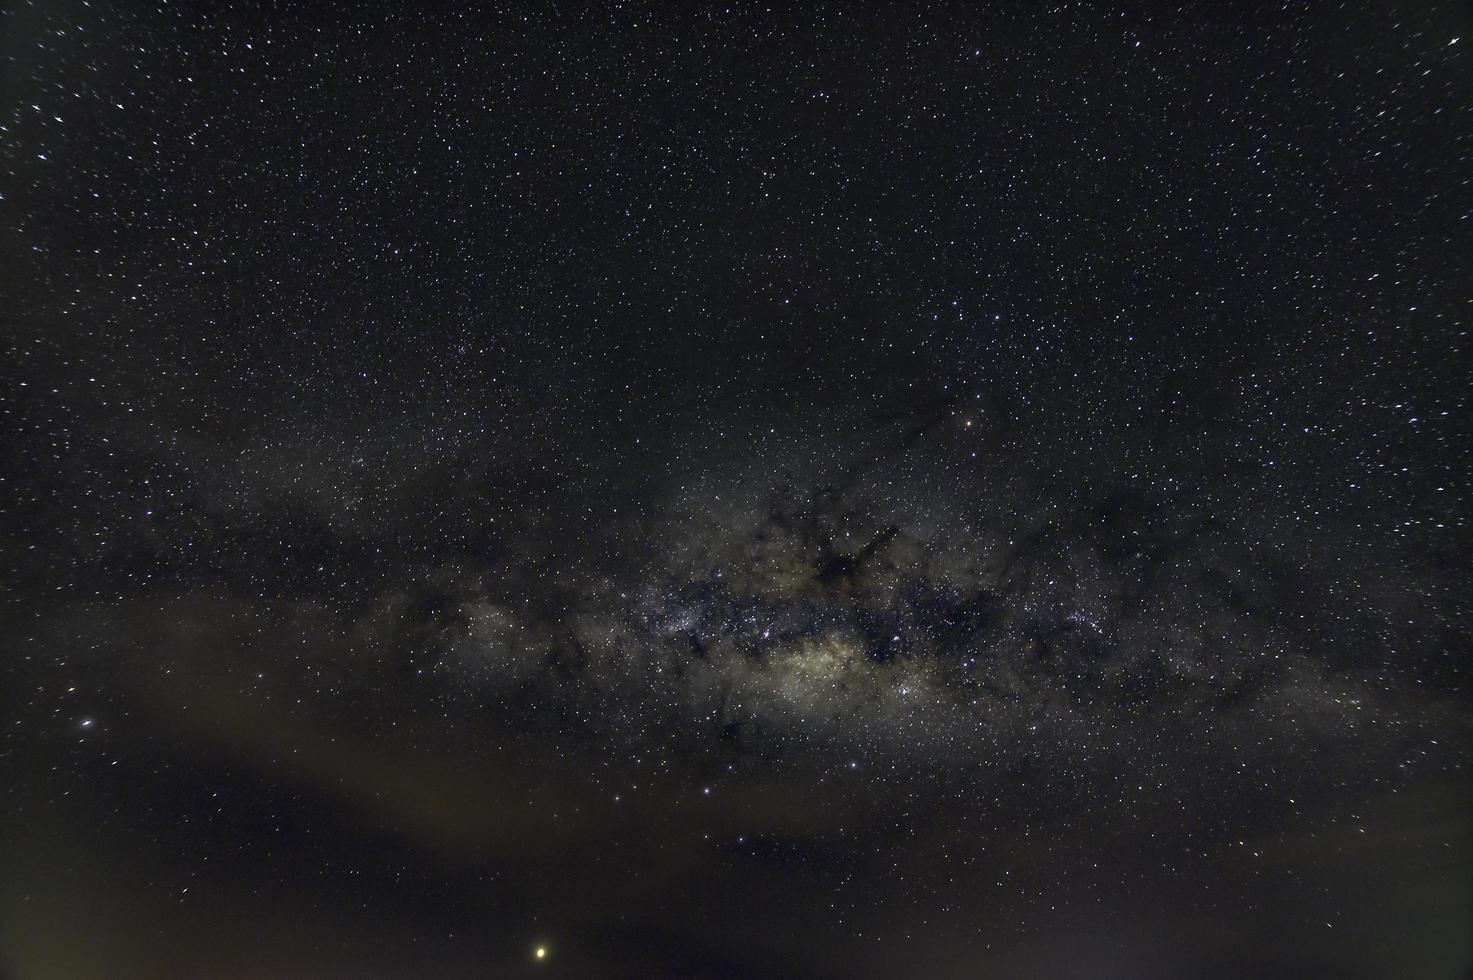 Starry night sky with Milk Way photo